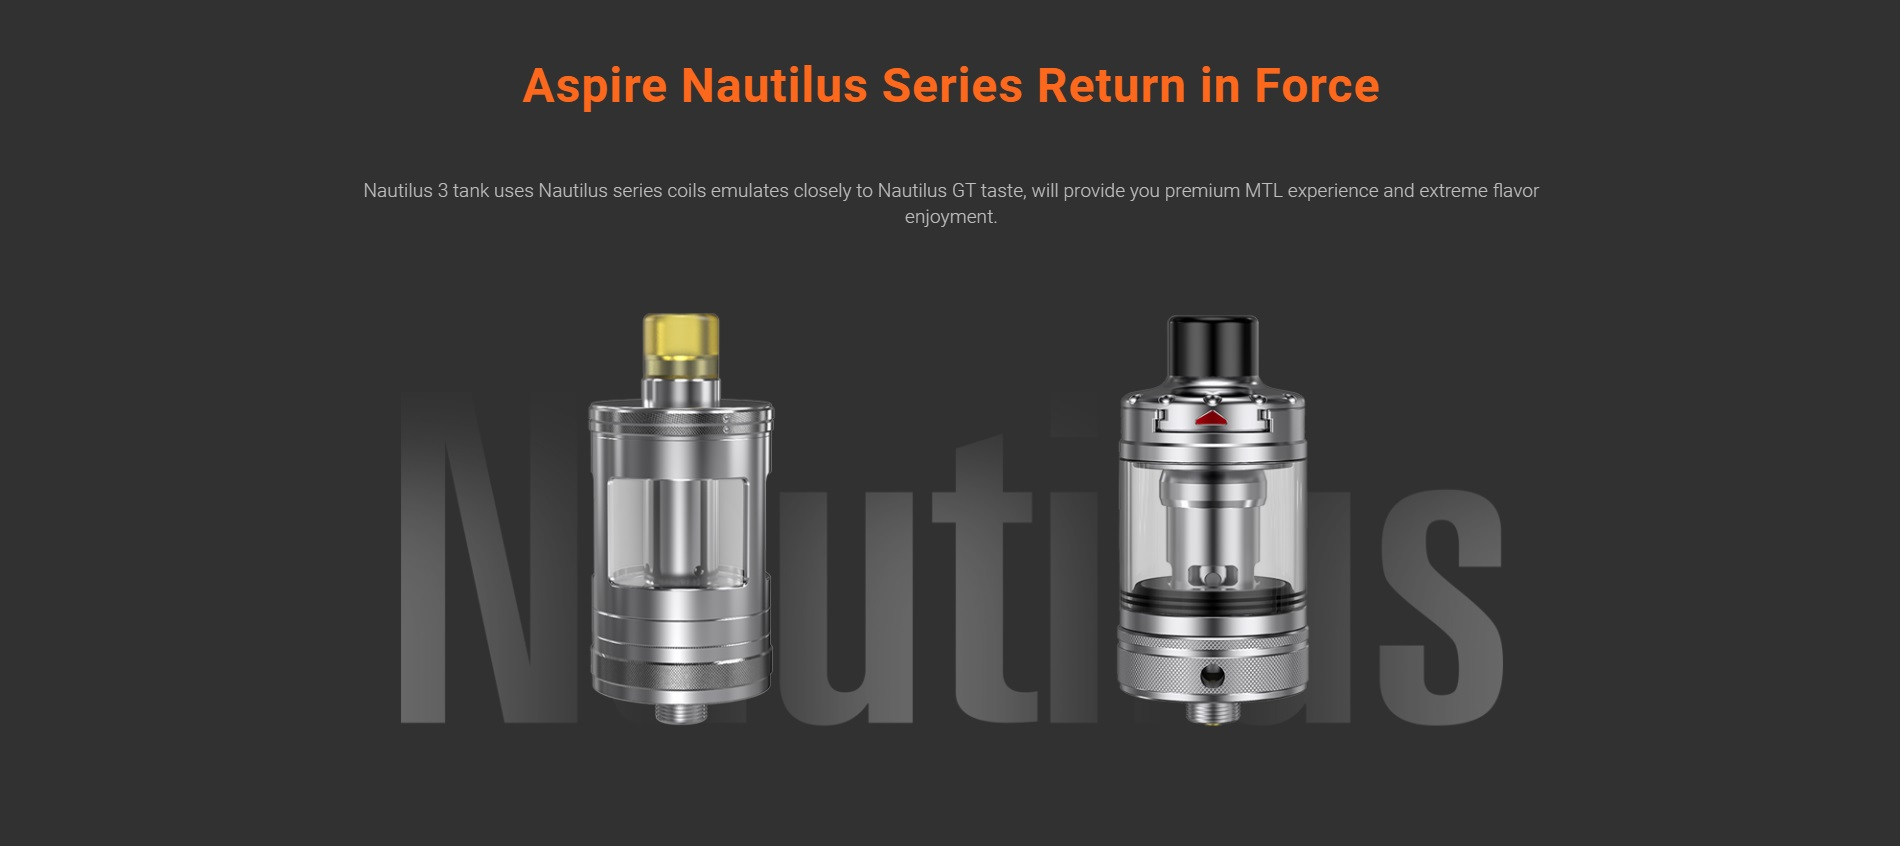 nautilus 3 tank 24mm by aspire 2 - Nautilus 3 Tank 24mm by Aspire